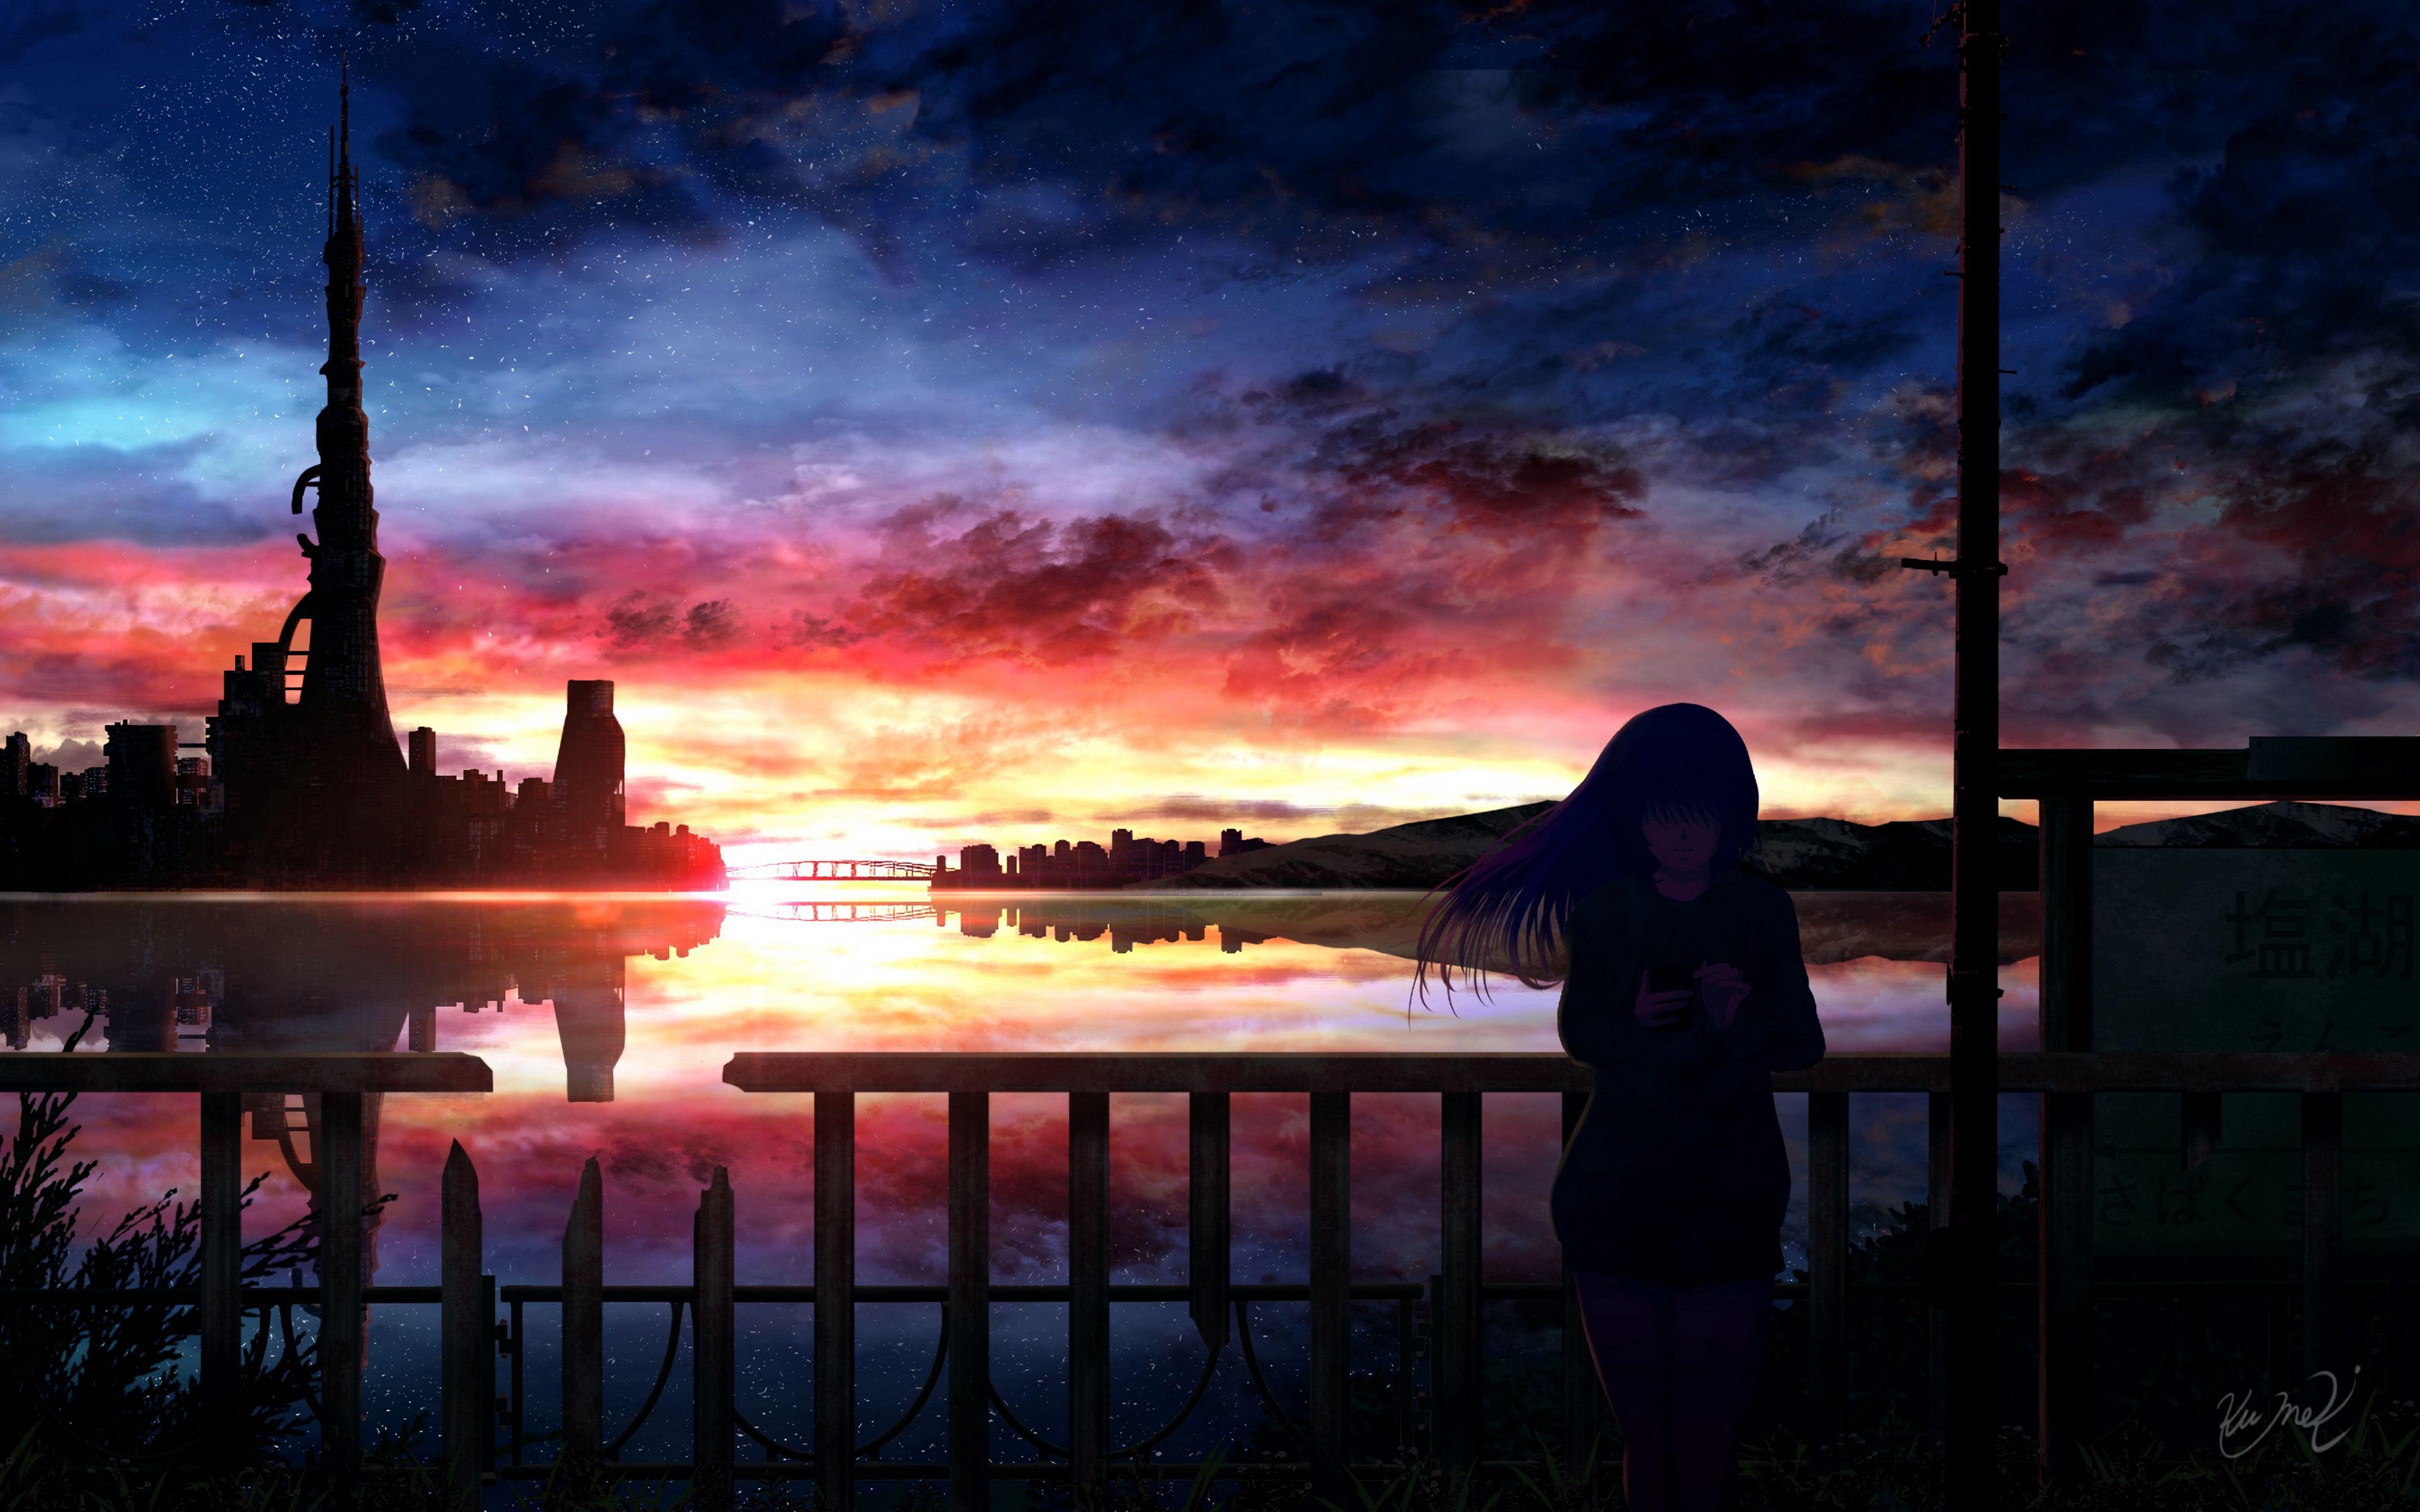 3840x2400 Wallpaper silhouette, night, starry sky, girl, anime